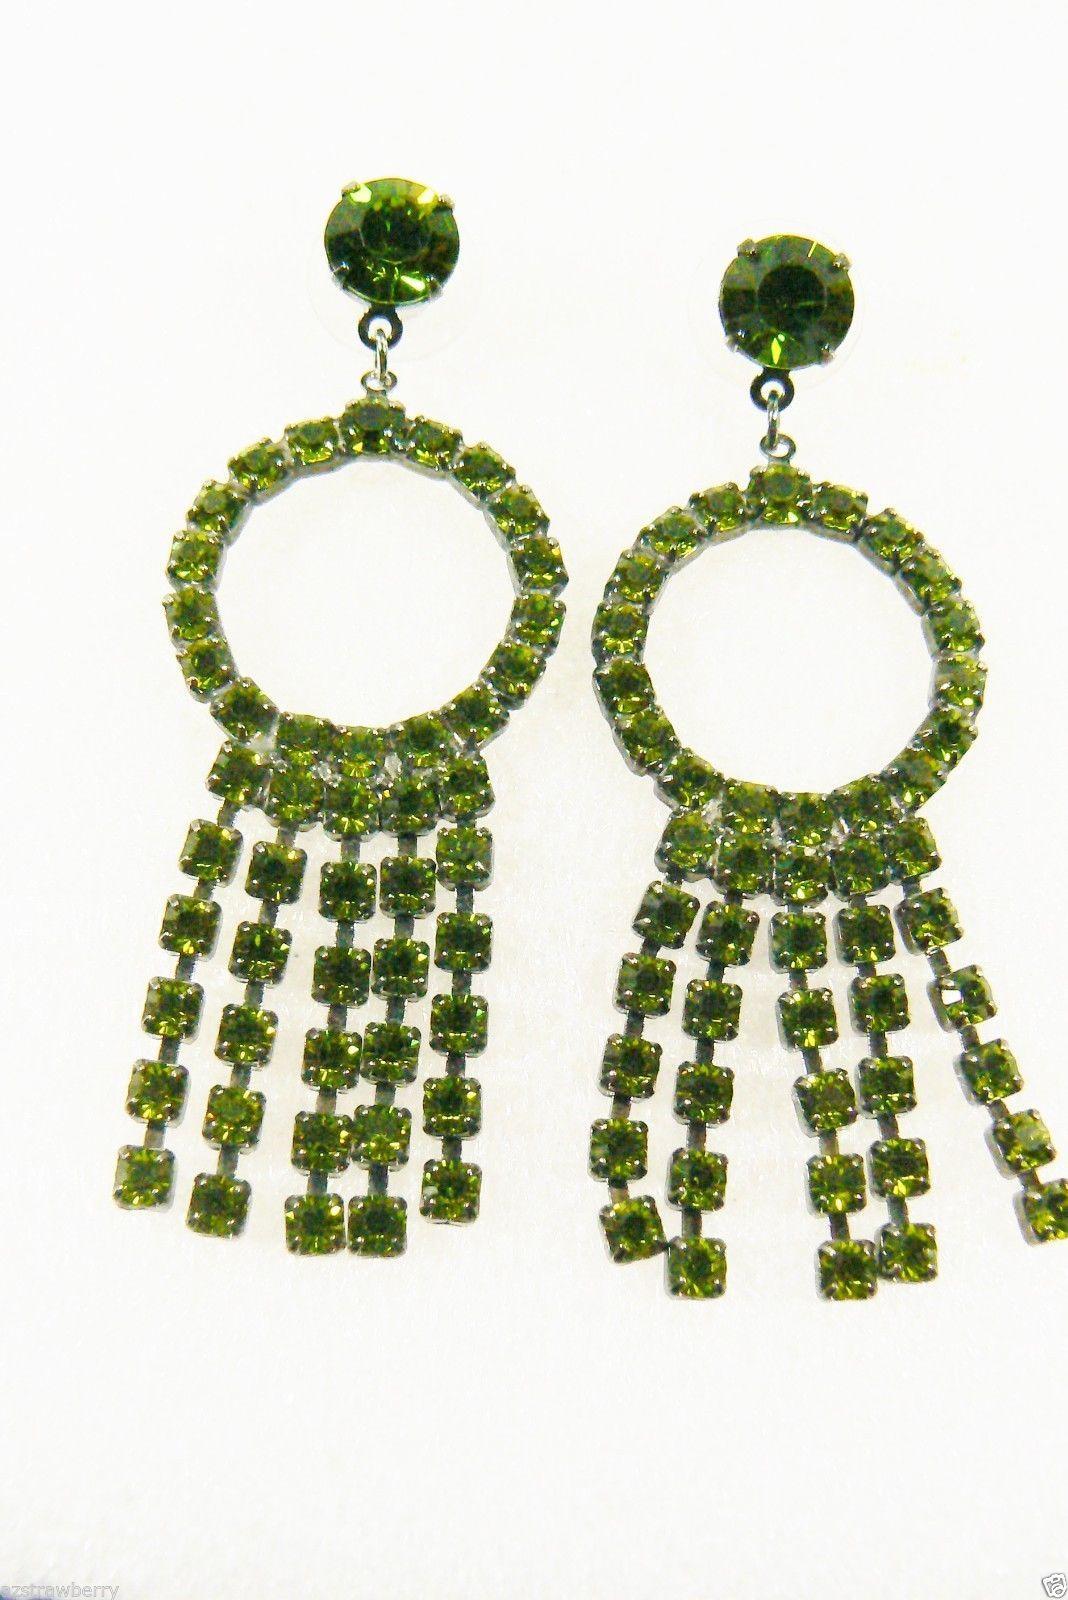 Fantastic Green Rhinestones Circle & Fringe Dangling Chandelier Earrings - $39.20